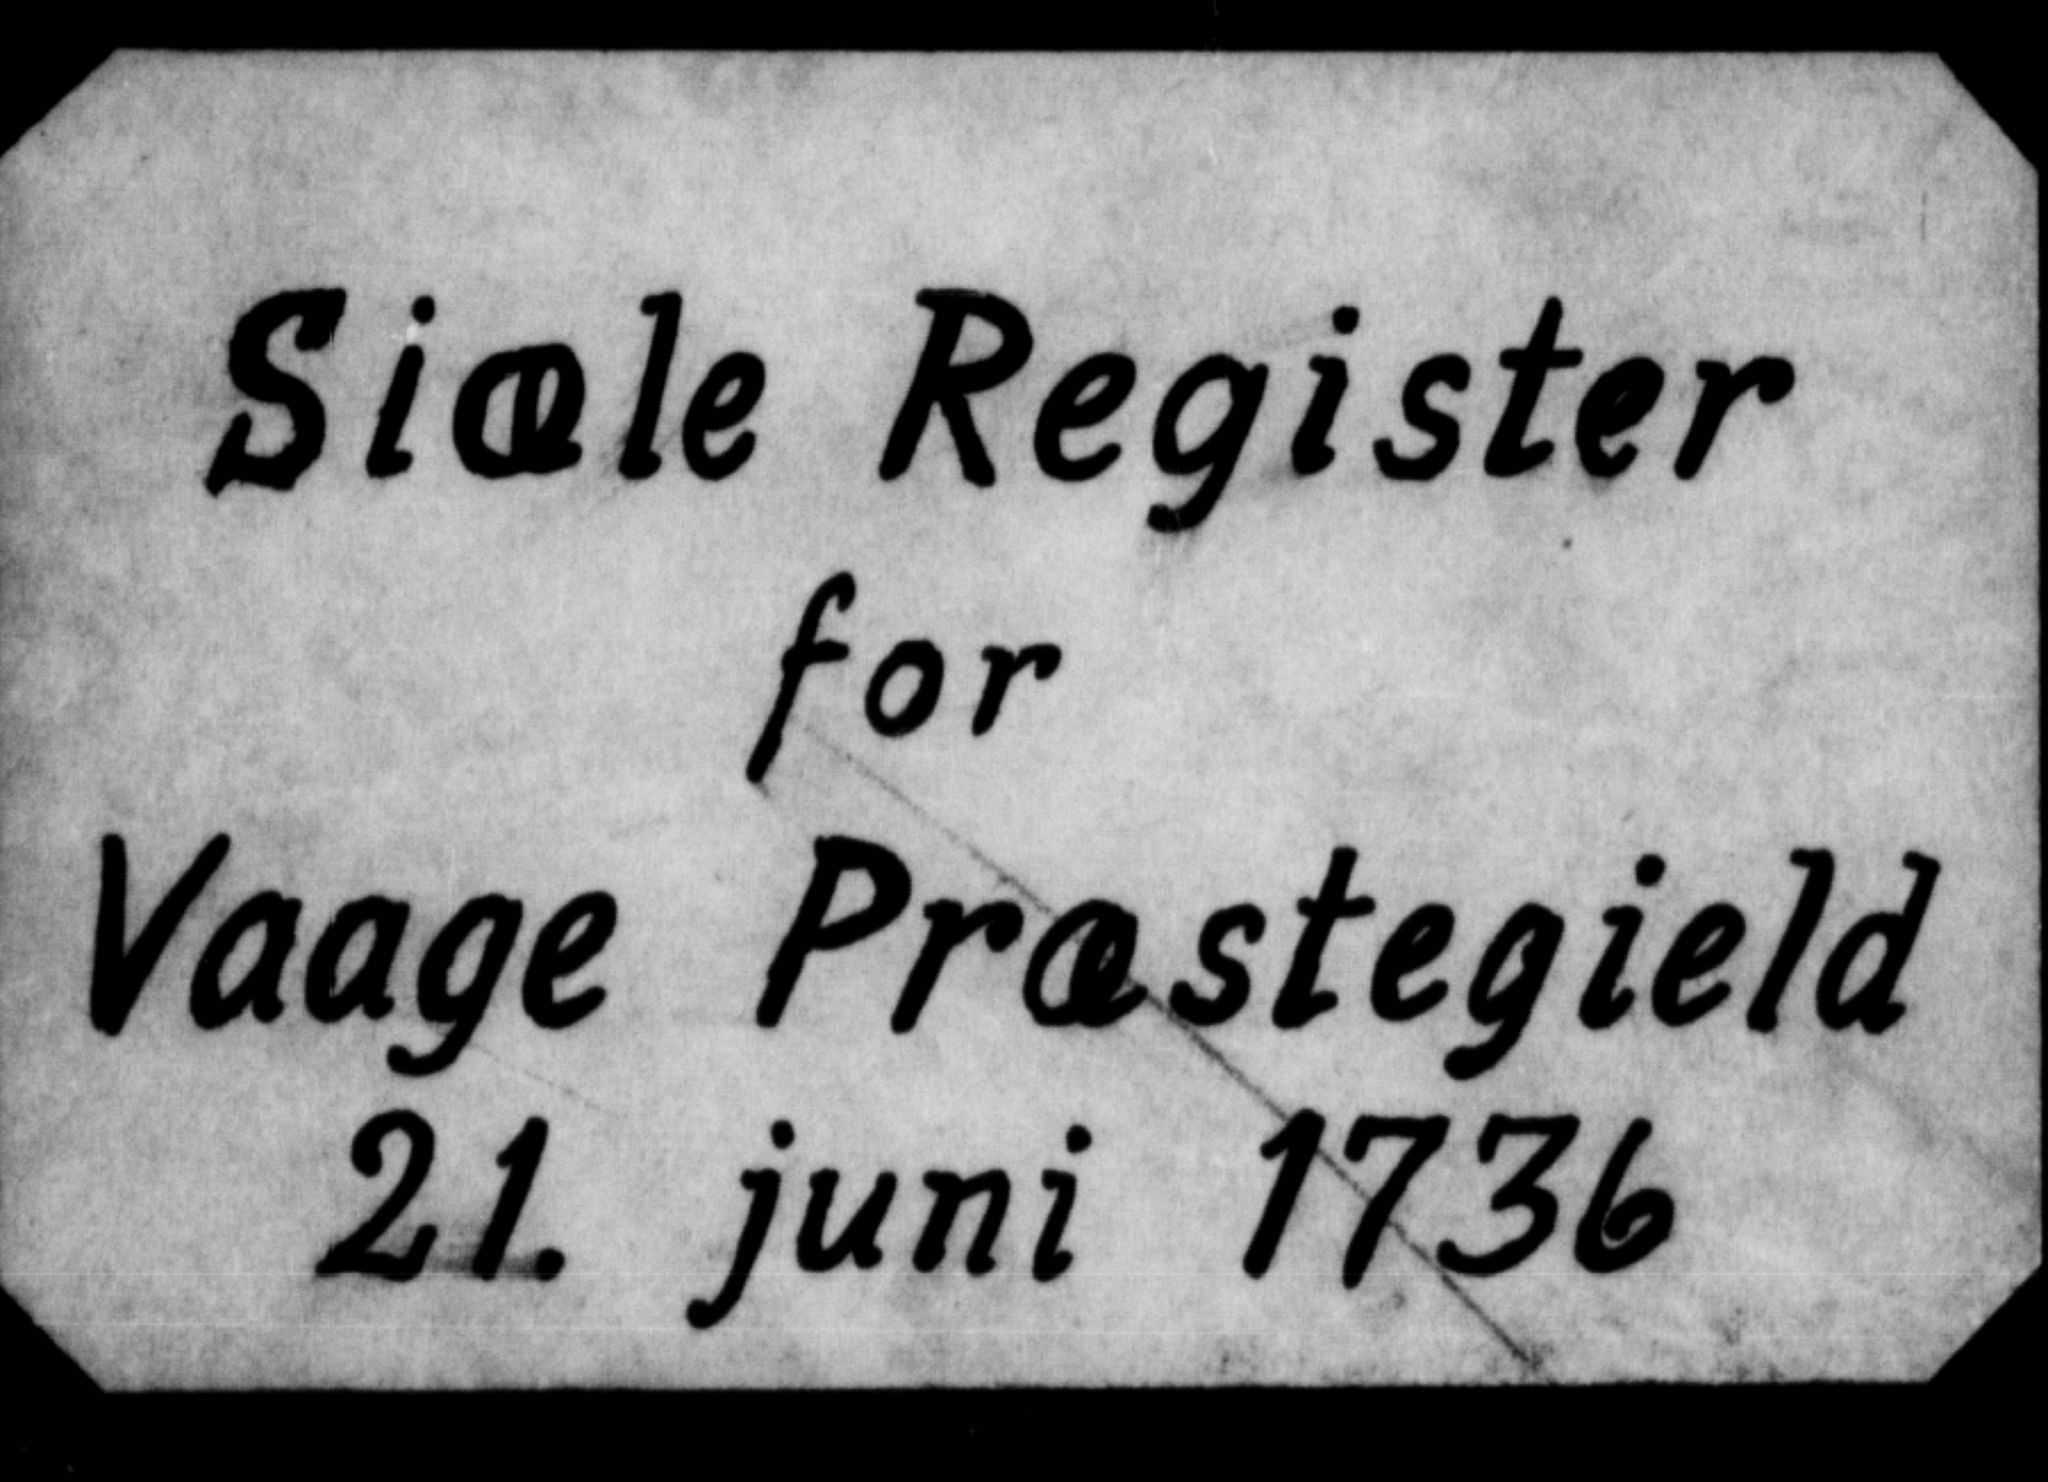 SAH, Vågå prestekontor, 1736, s. upaginert